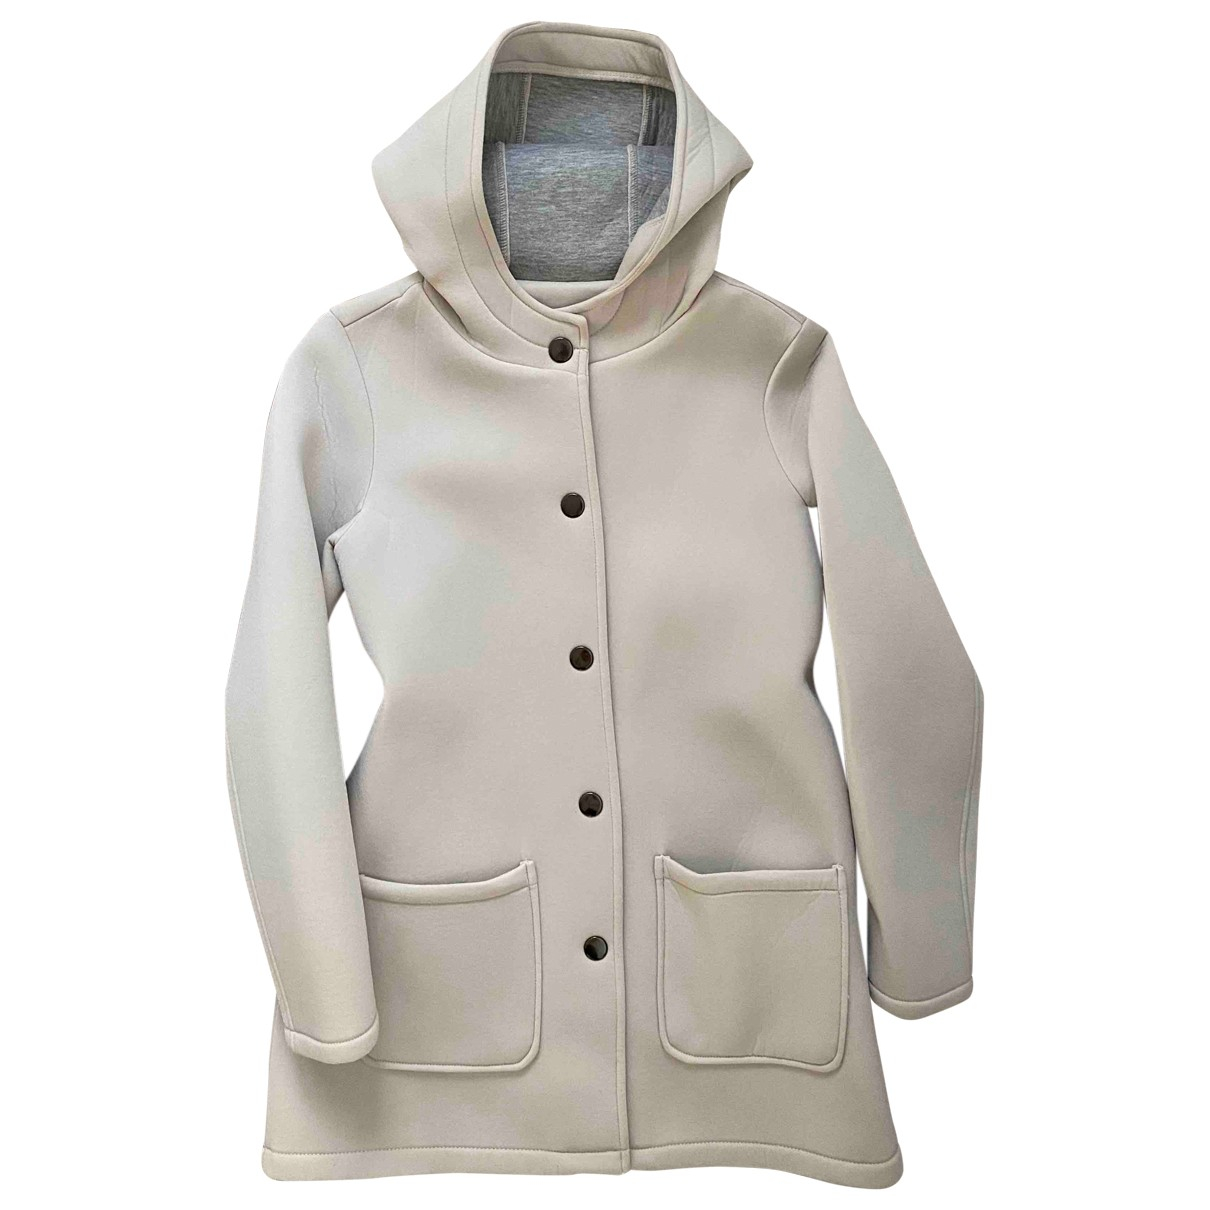 tophop N White jacket for Women S International